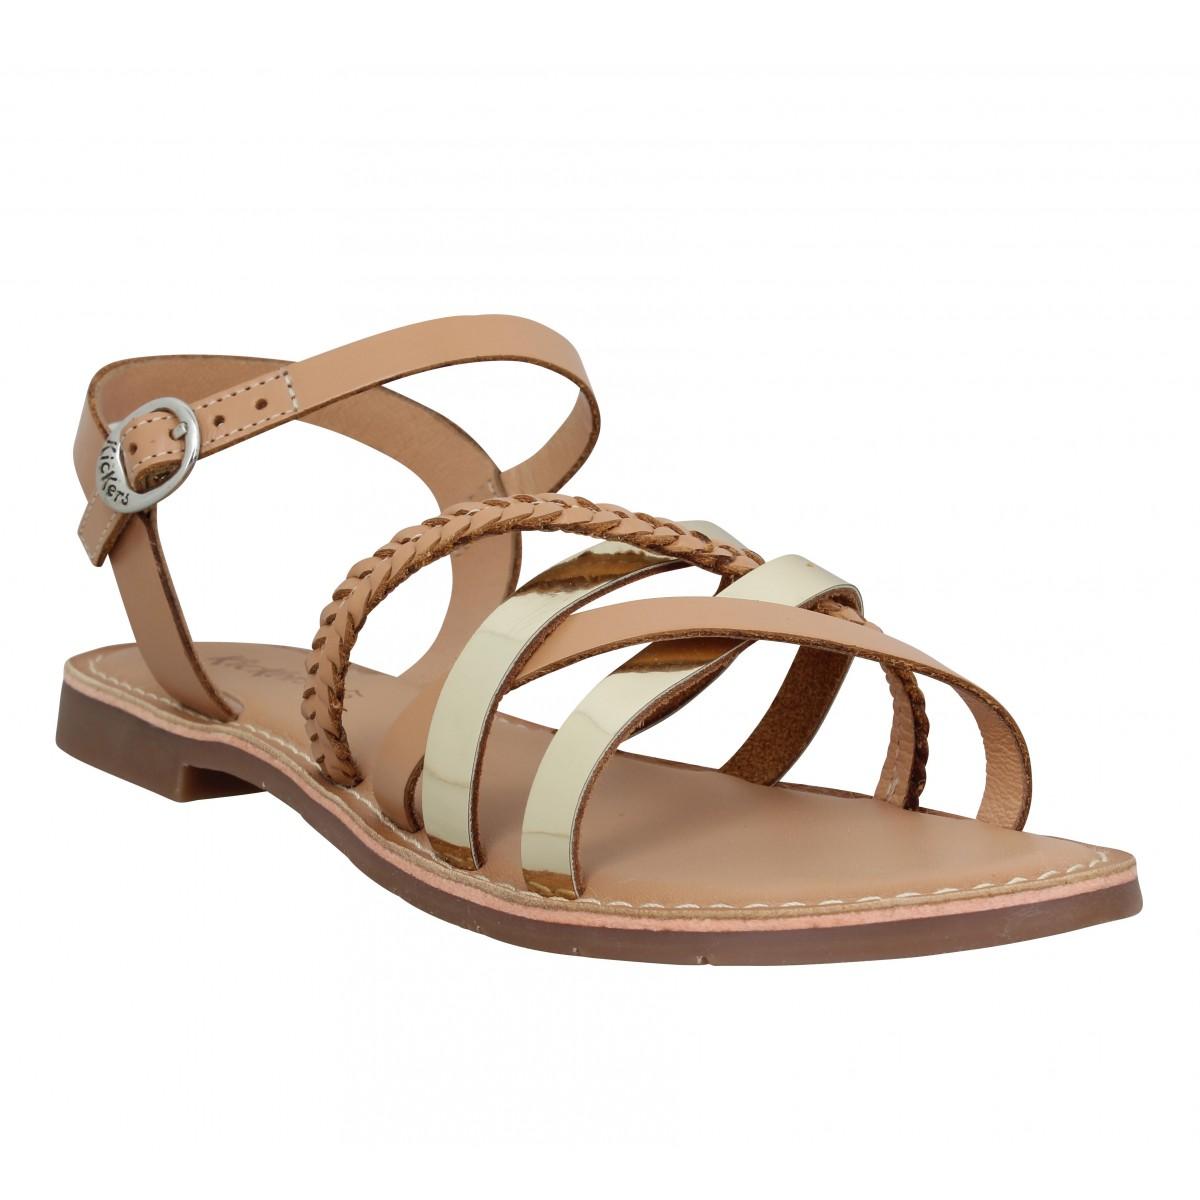 Nu-pieds KICKERS Estellie cuir Femme Camel Or